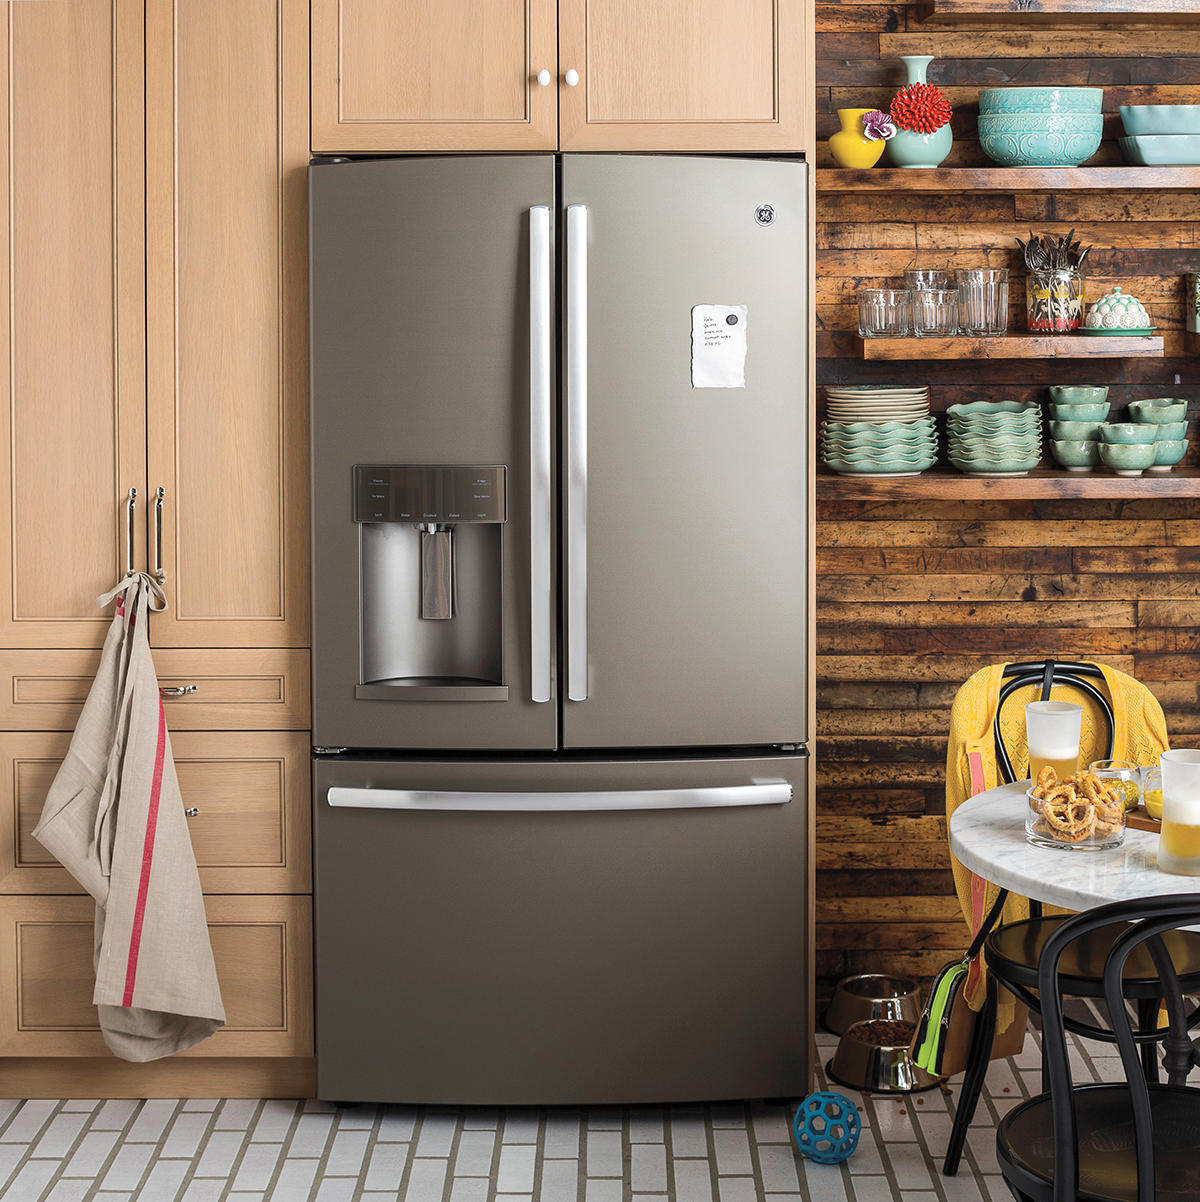 Uncategorized American Kitchen Appliances ge appliances at best buy budget savvy diva